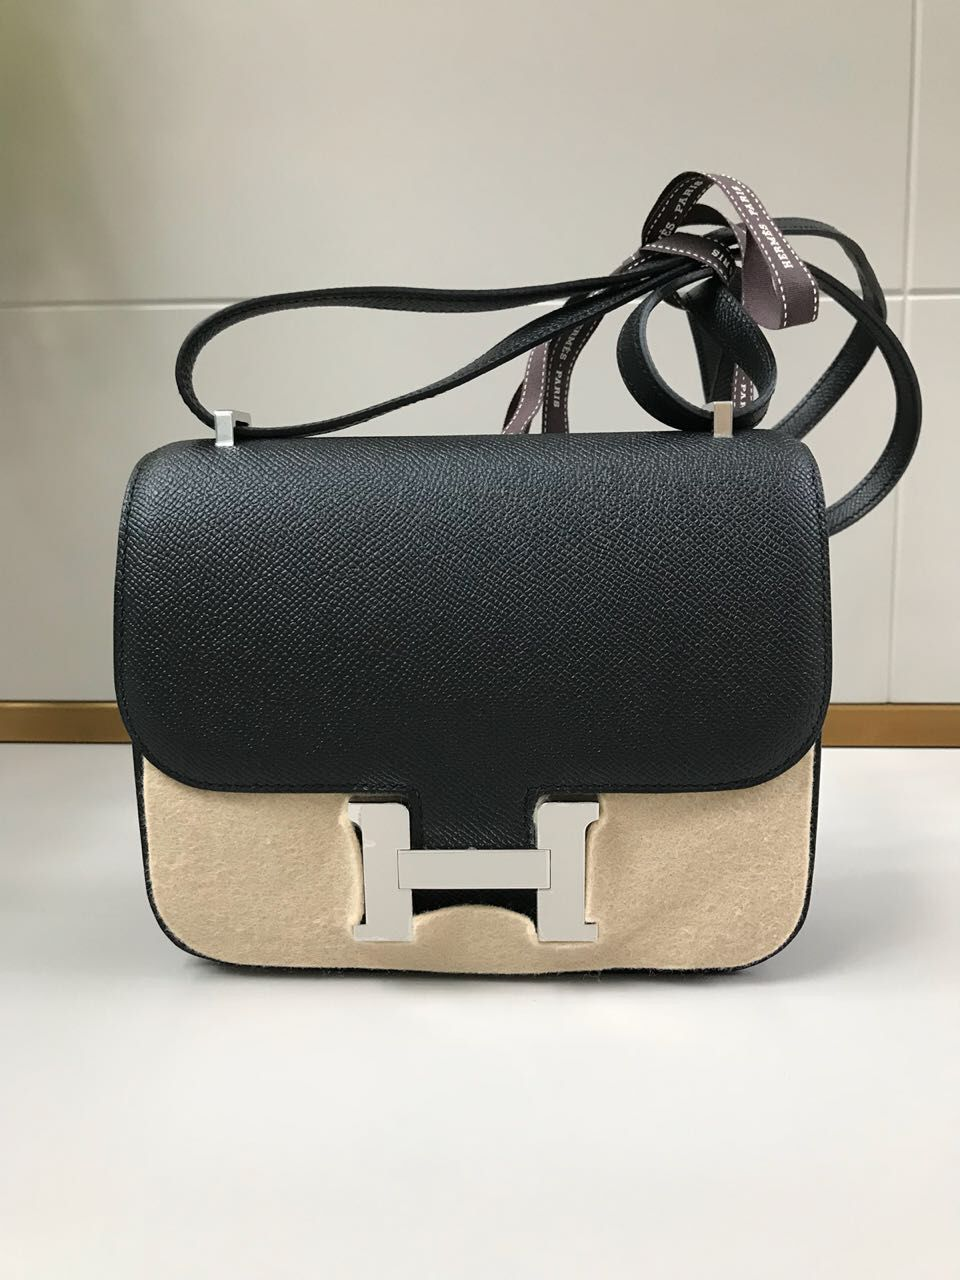 f30ae1566d4e Hermès Constance 18 Noir (Black) Epsom Palladium Hardware PHW C Stamp 2018   constance18